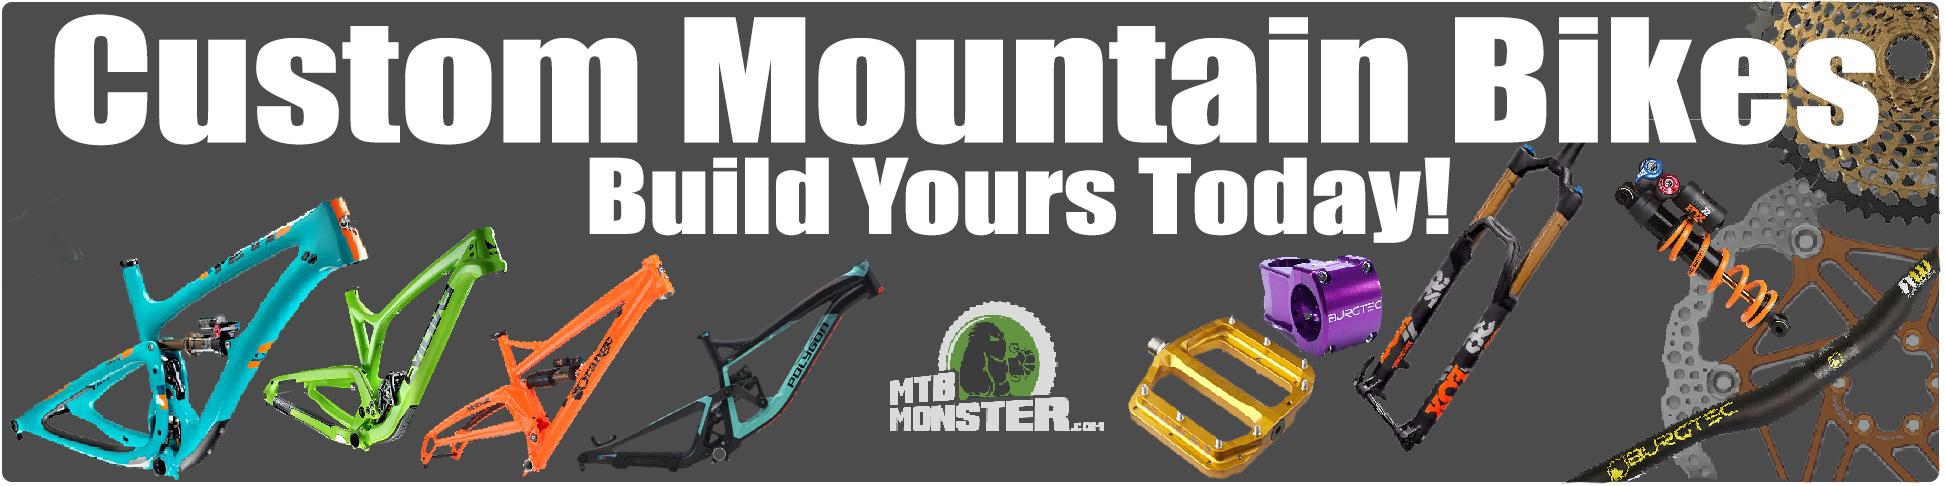 custom mountain bikes